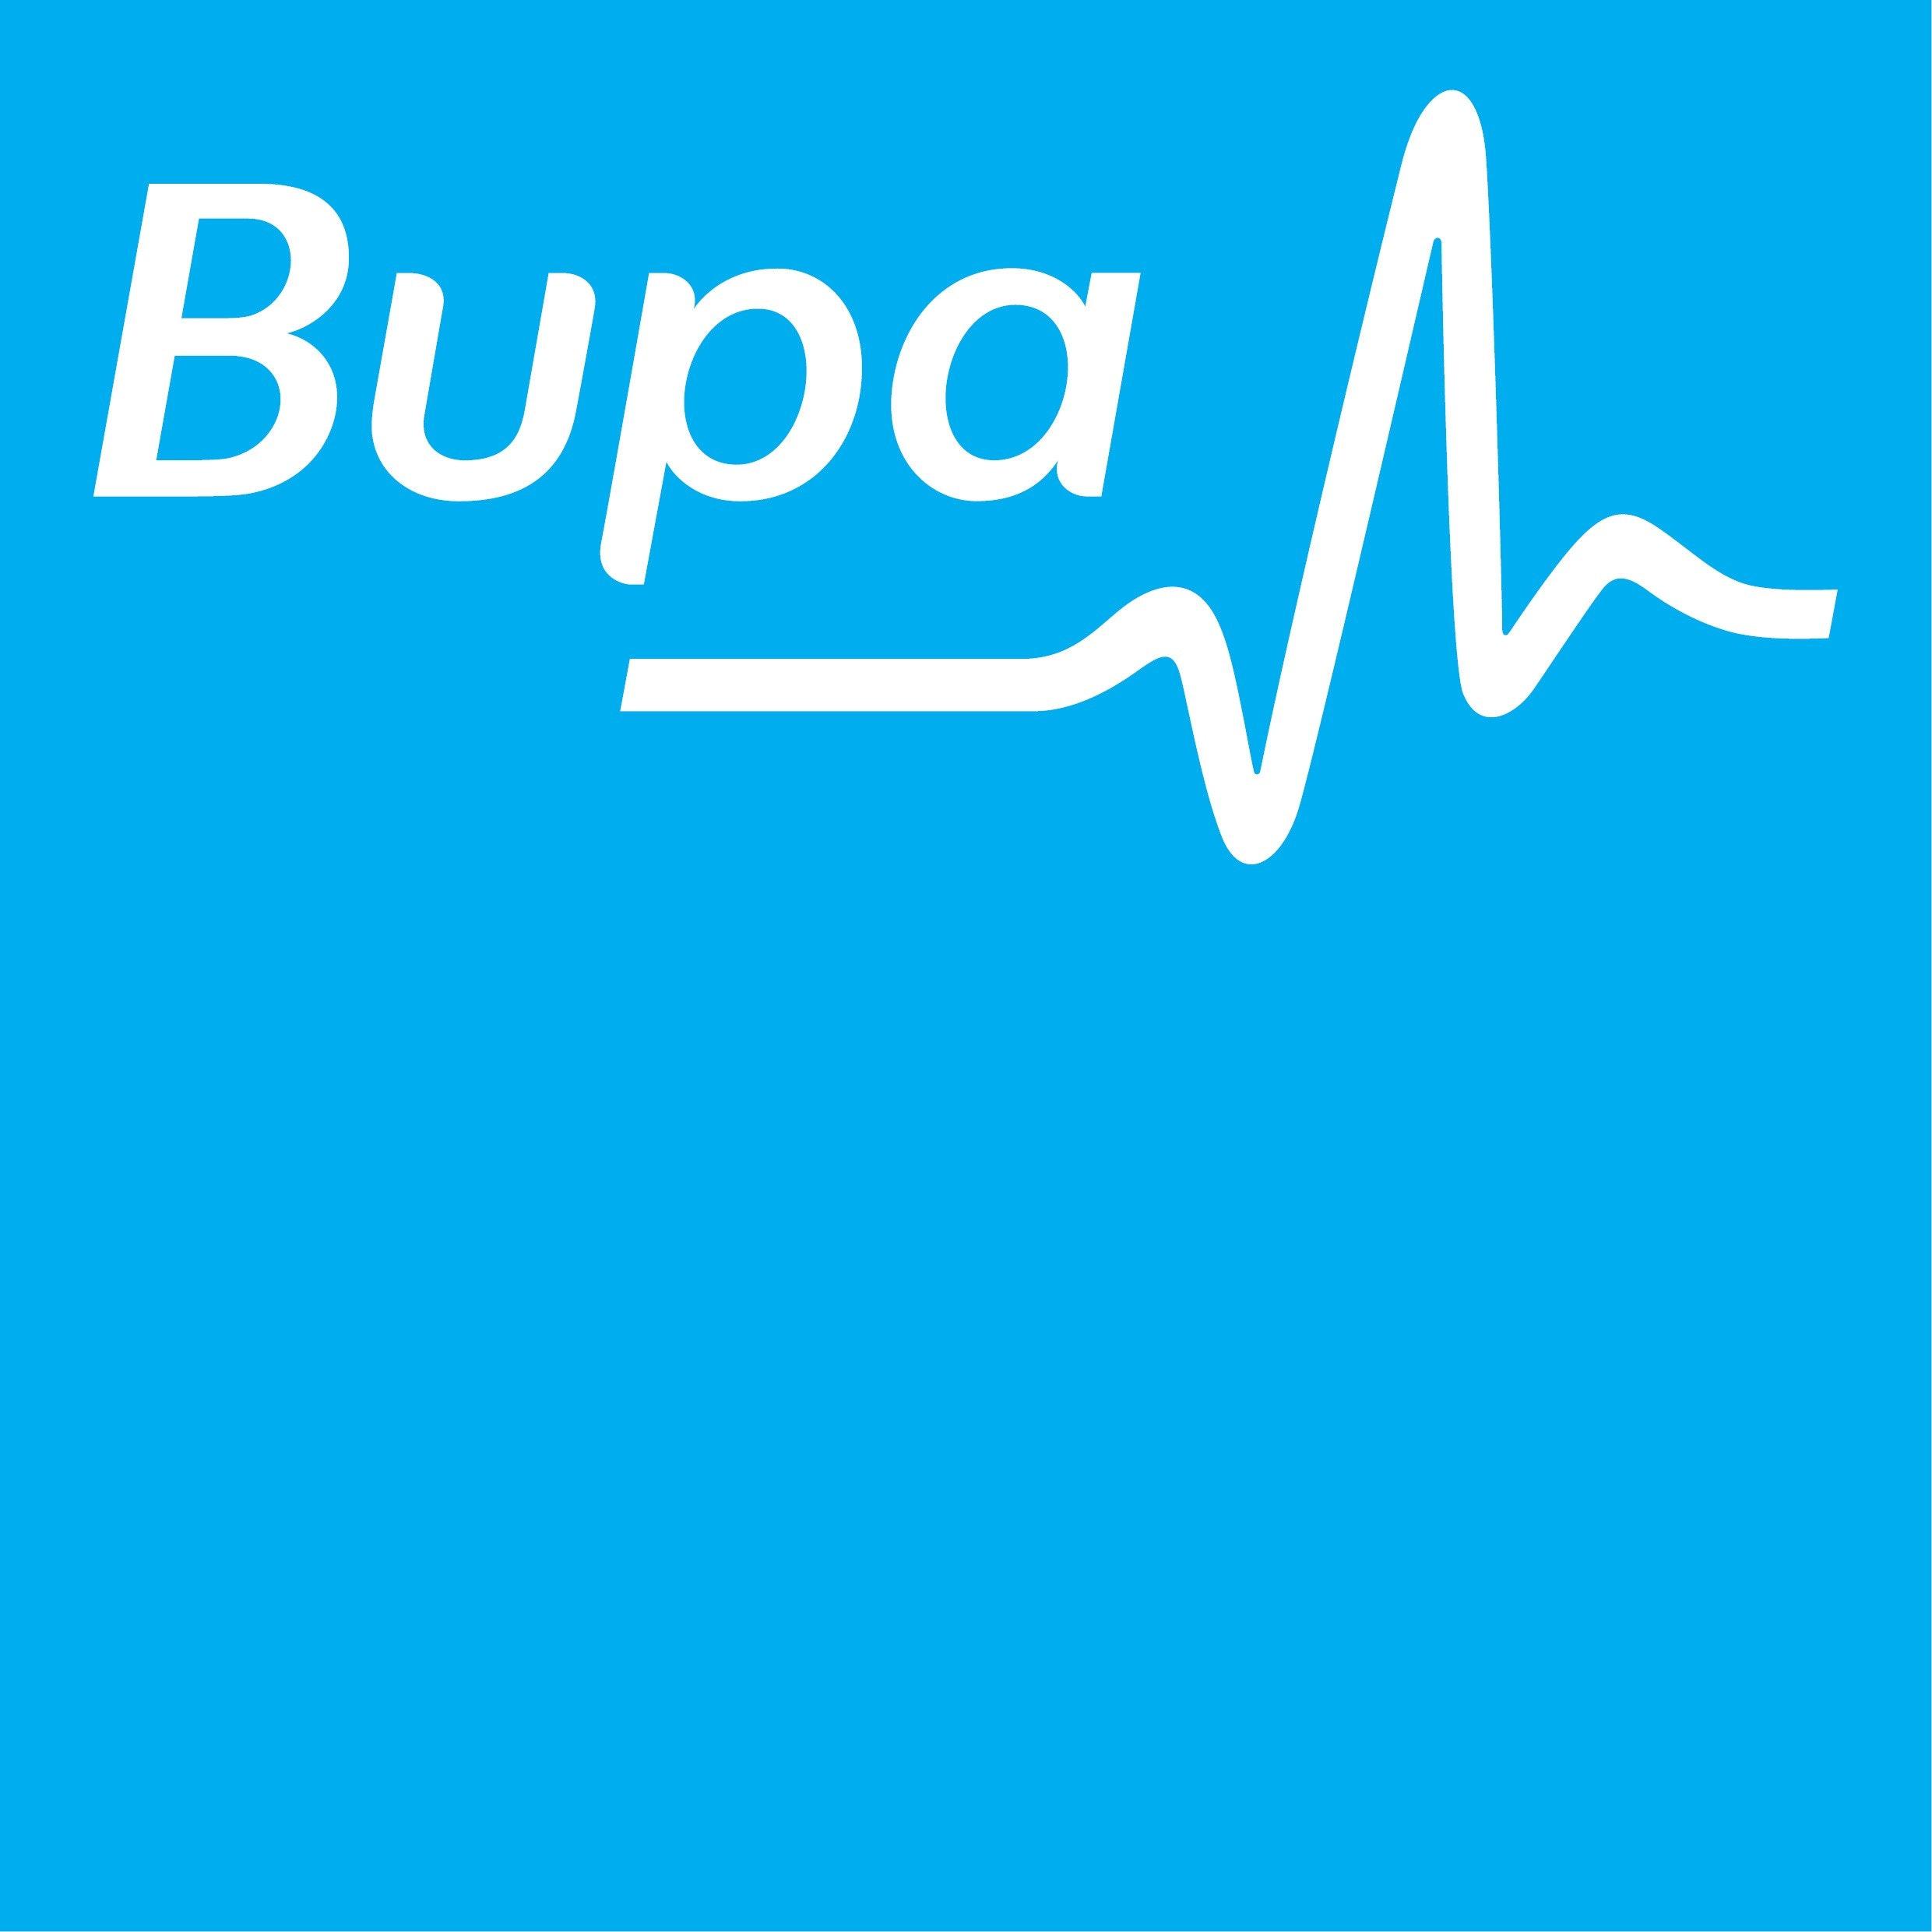 Bupa Maroubra logo